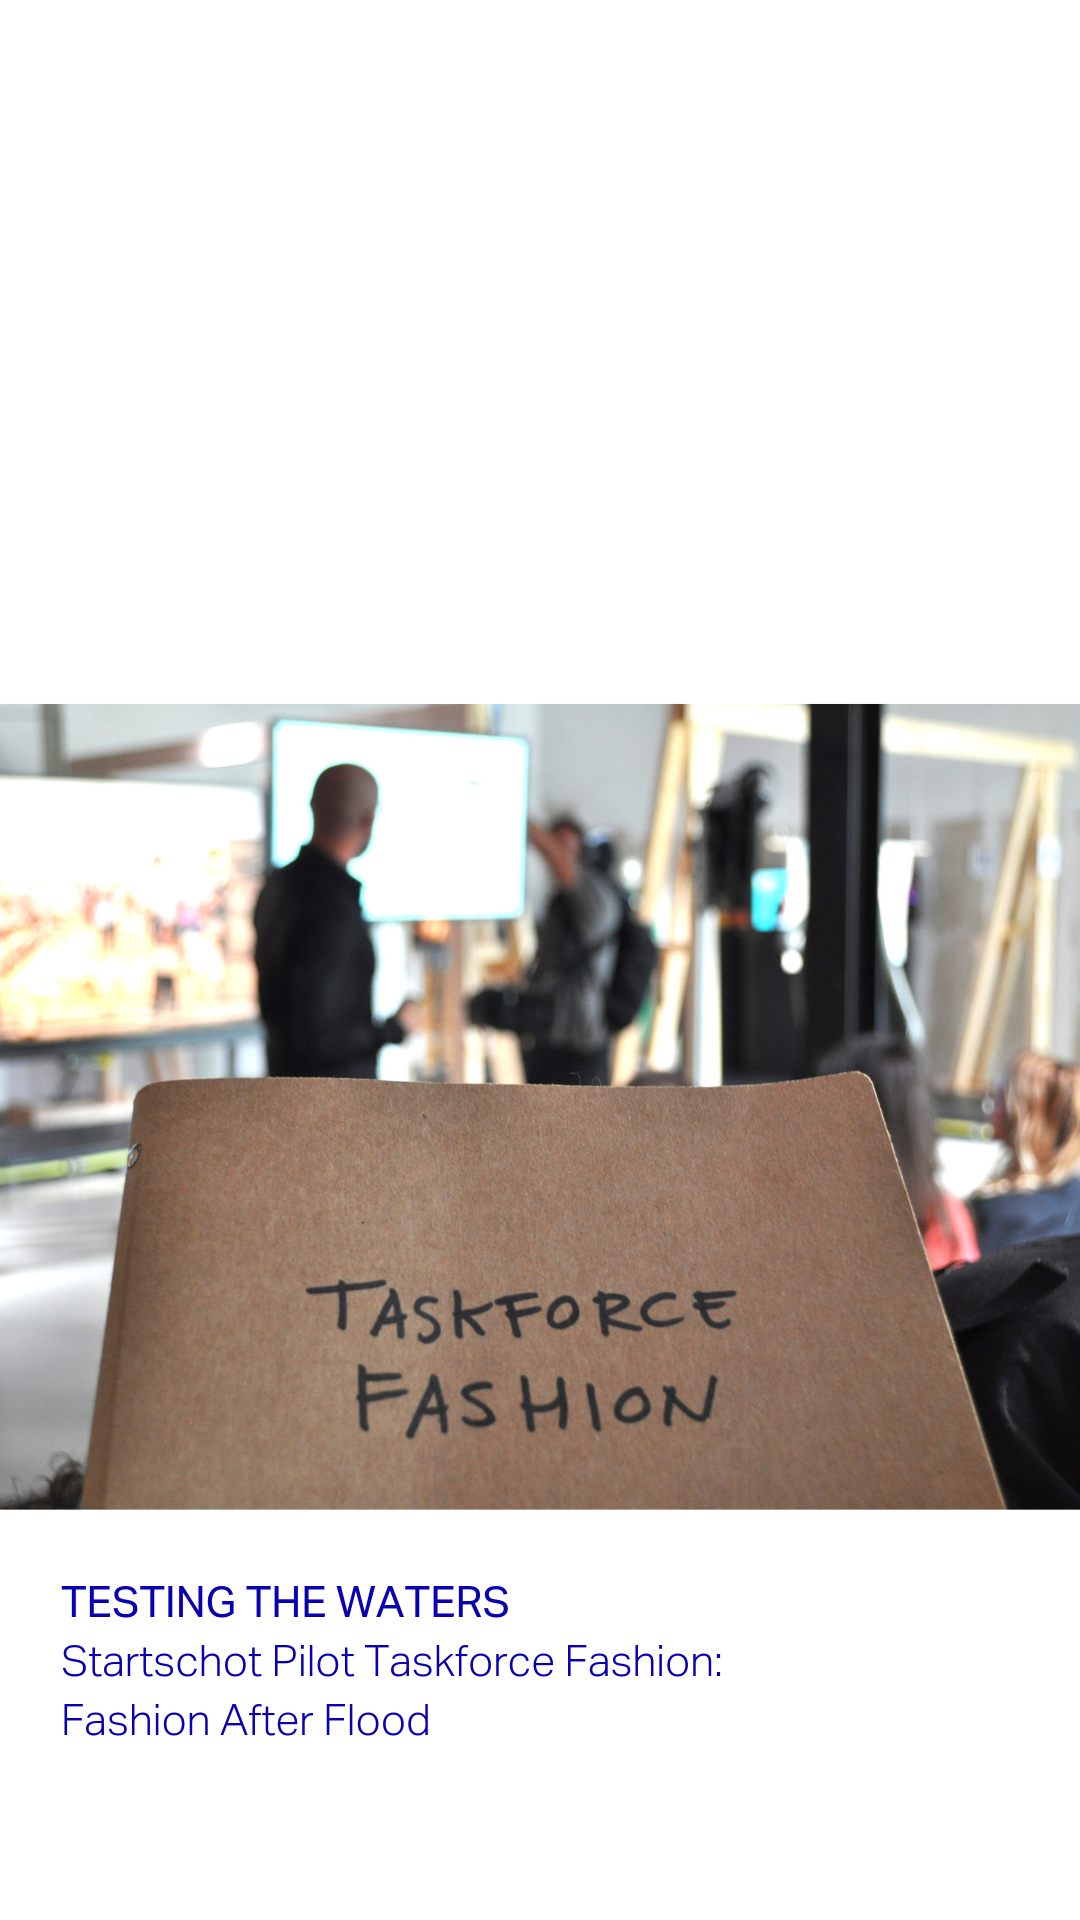 Taskforce-fashion-fashion-after-flood-kennismaking-algemeen5.png.png